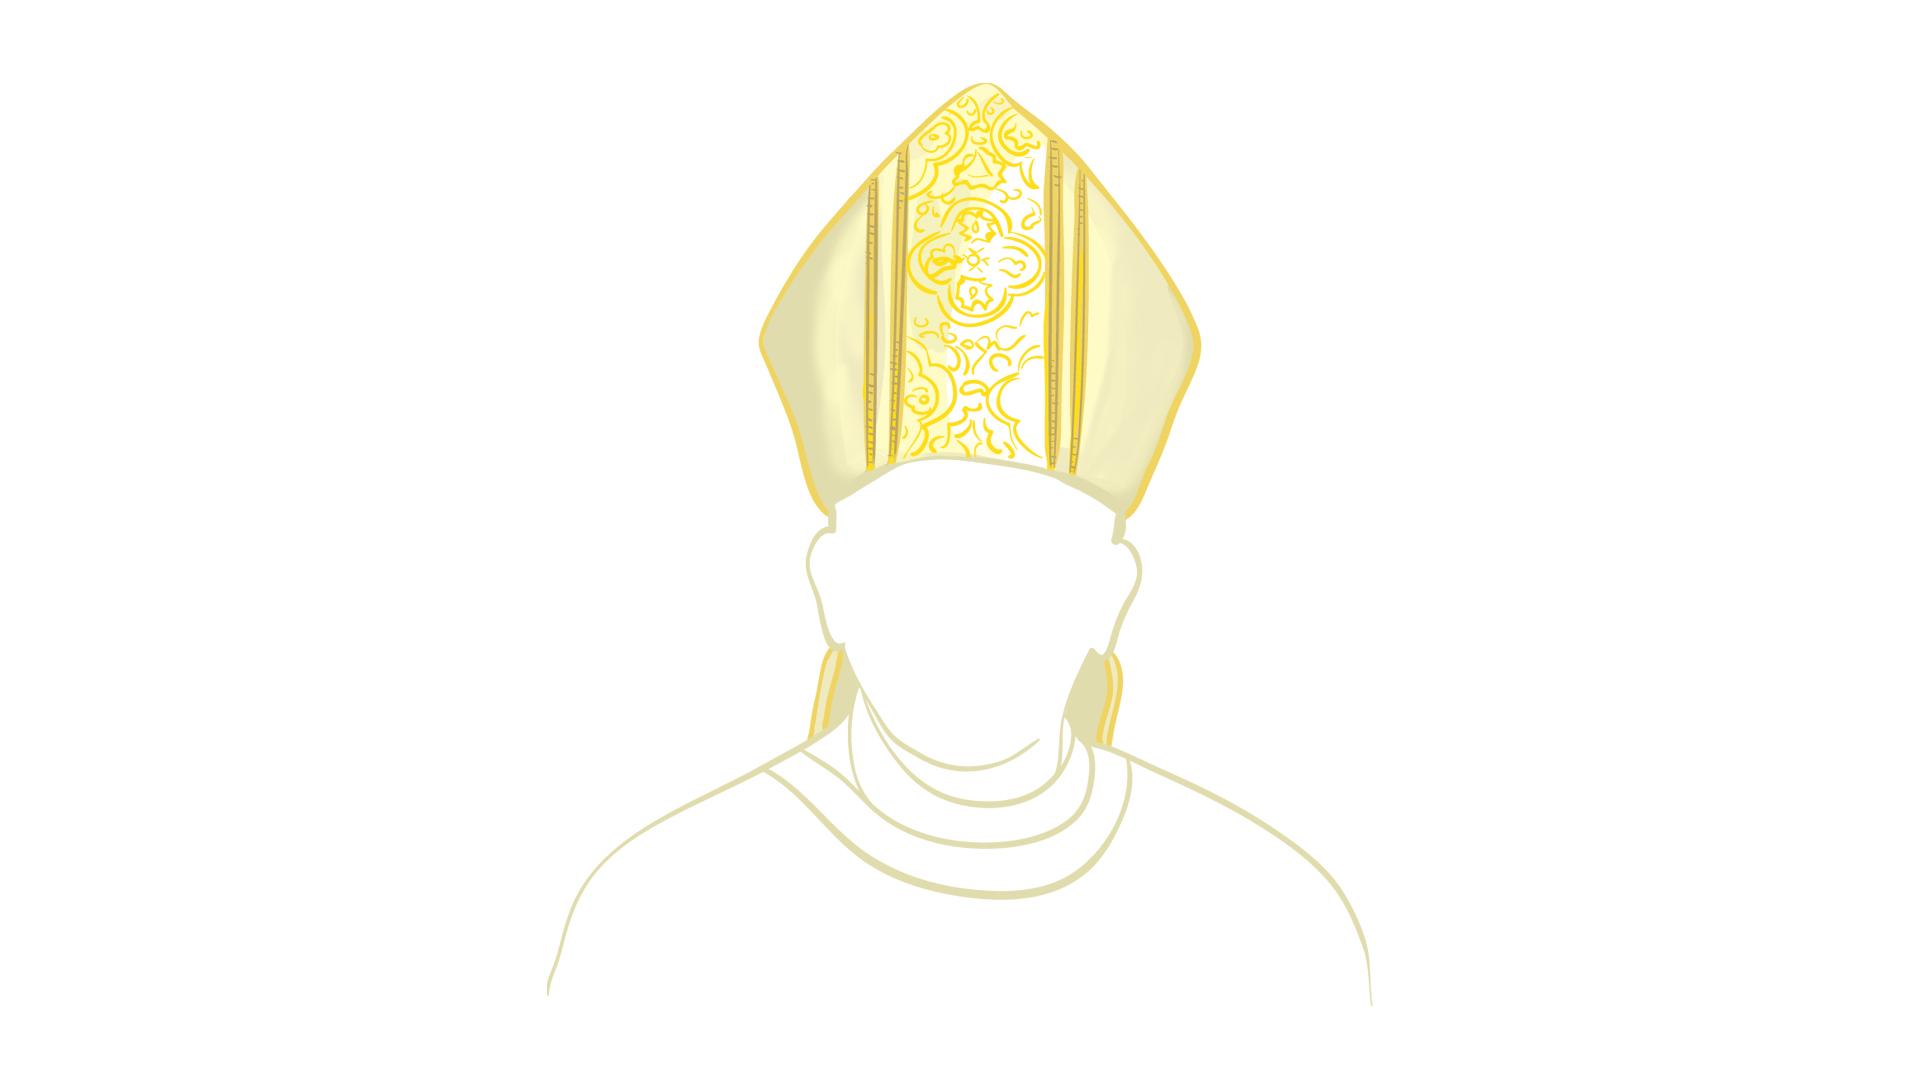 biskup_cepice